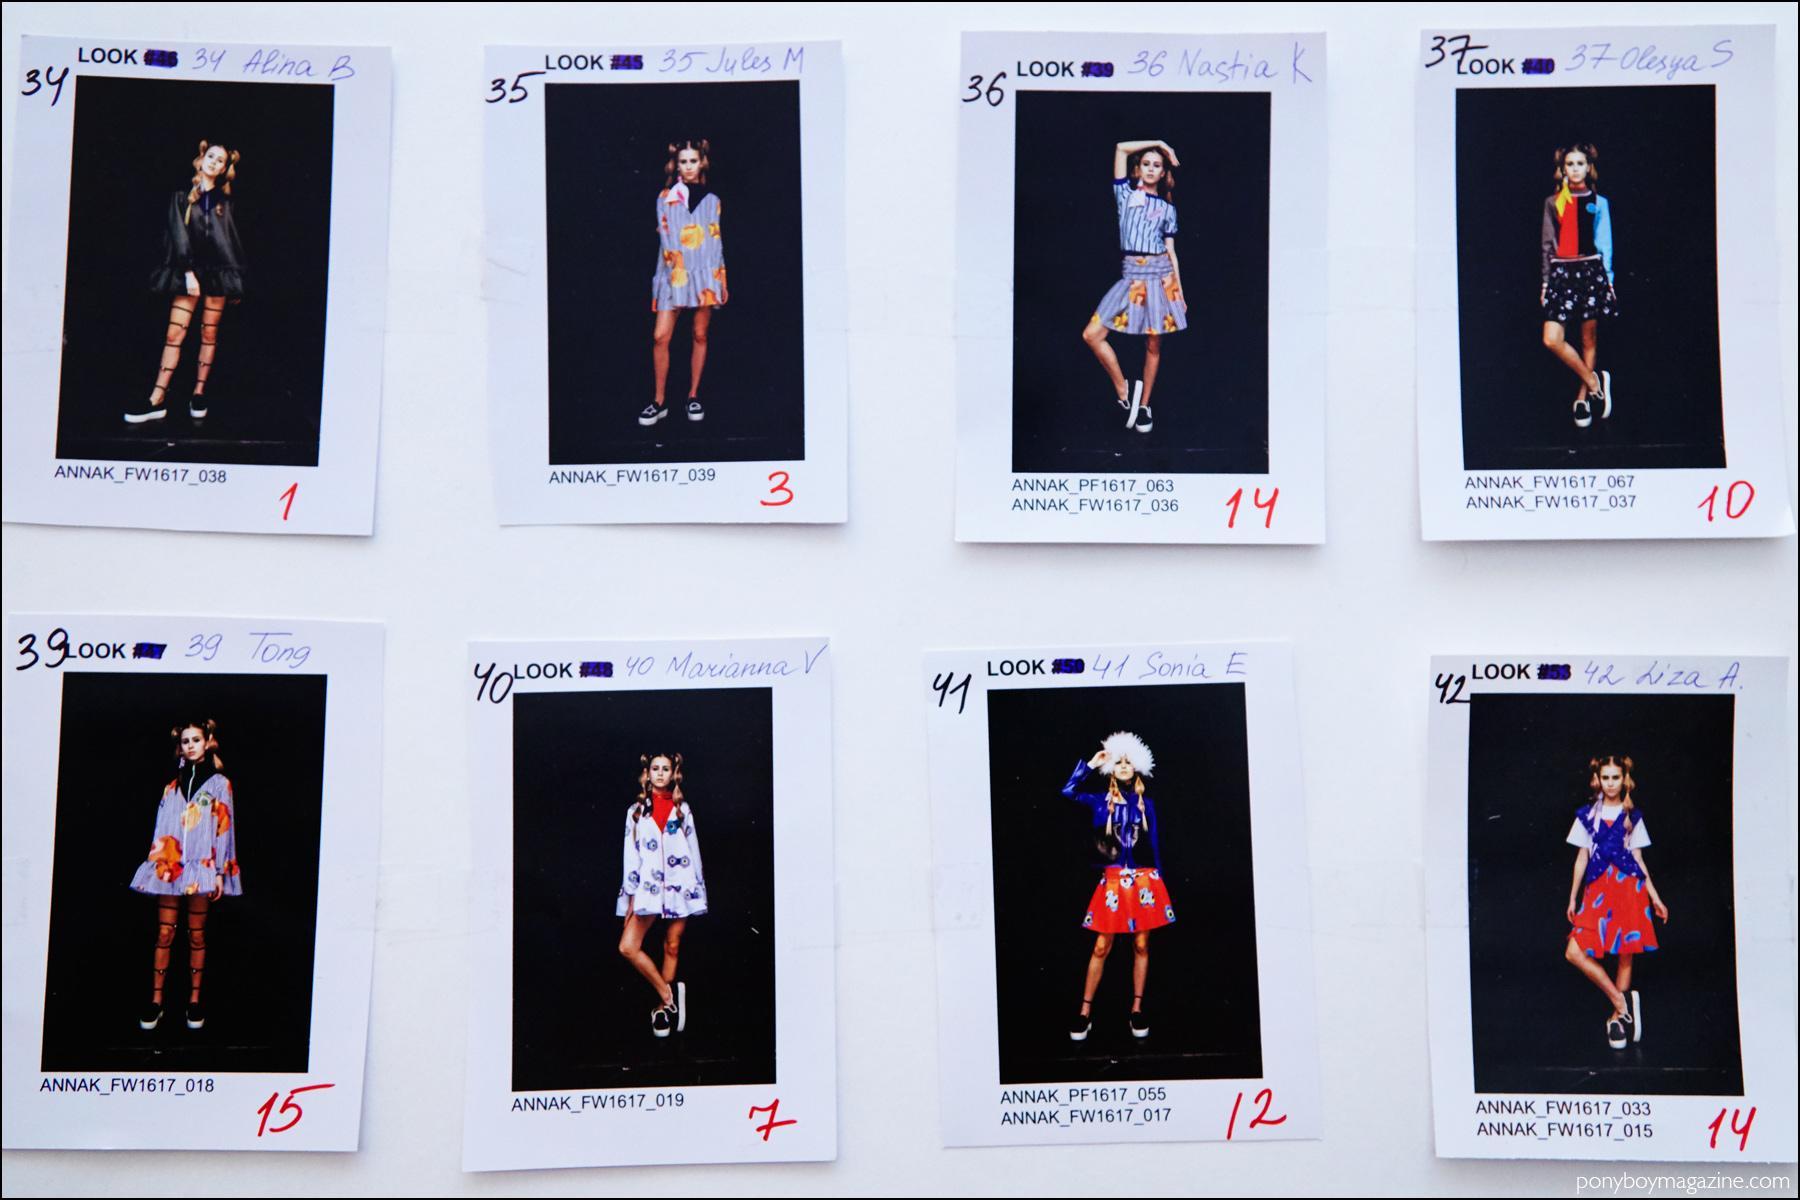 Polaroids of models looks, backstage at Anna K F/W16 womenswear show. Photography by Alexander Thompson for Ponyboy magazine NY.